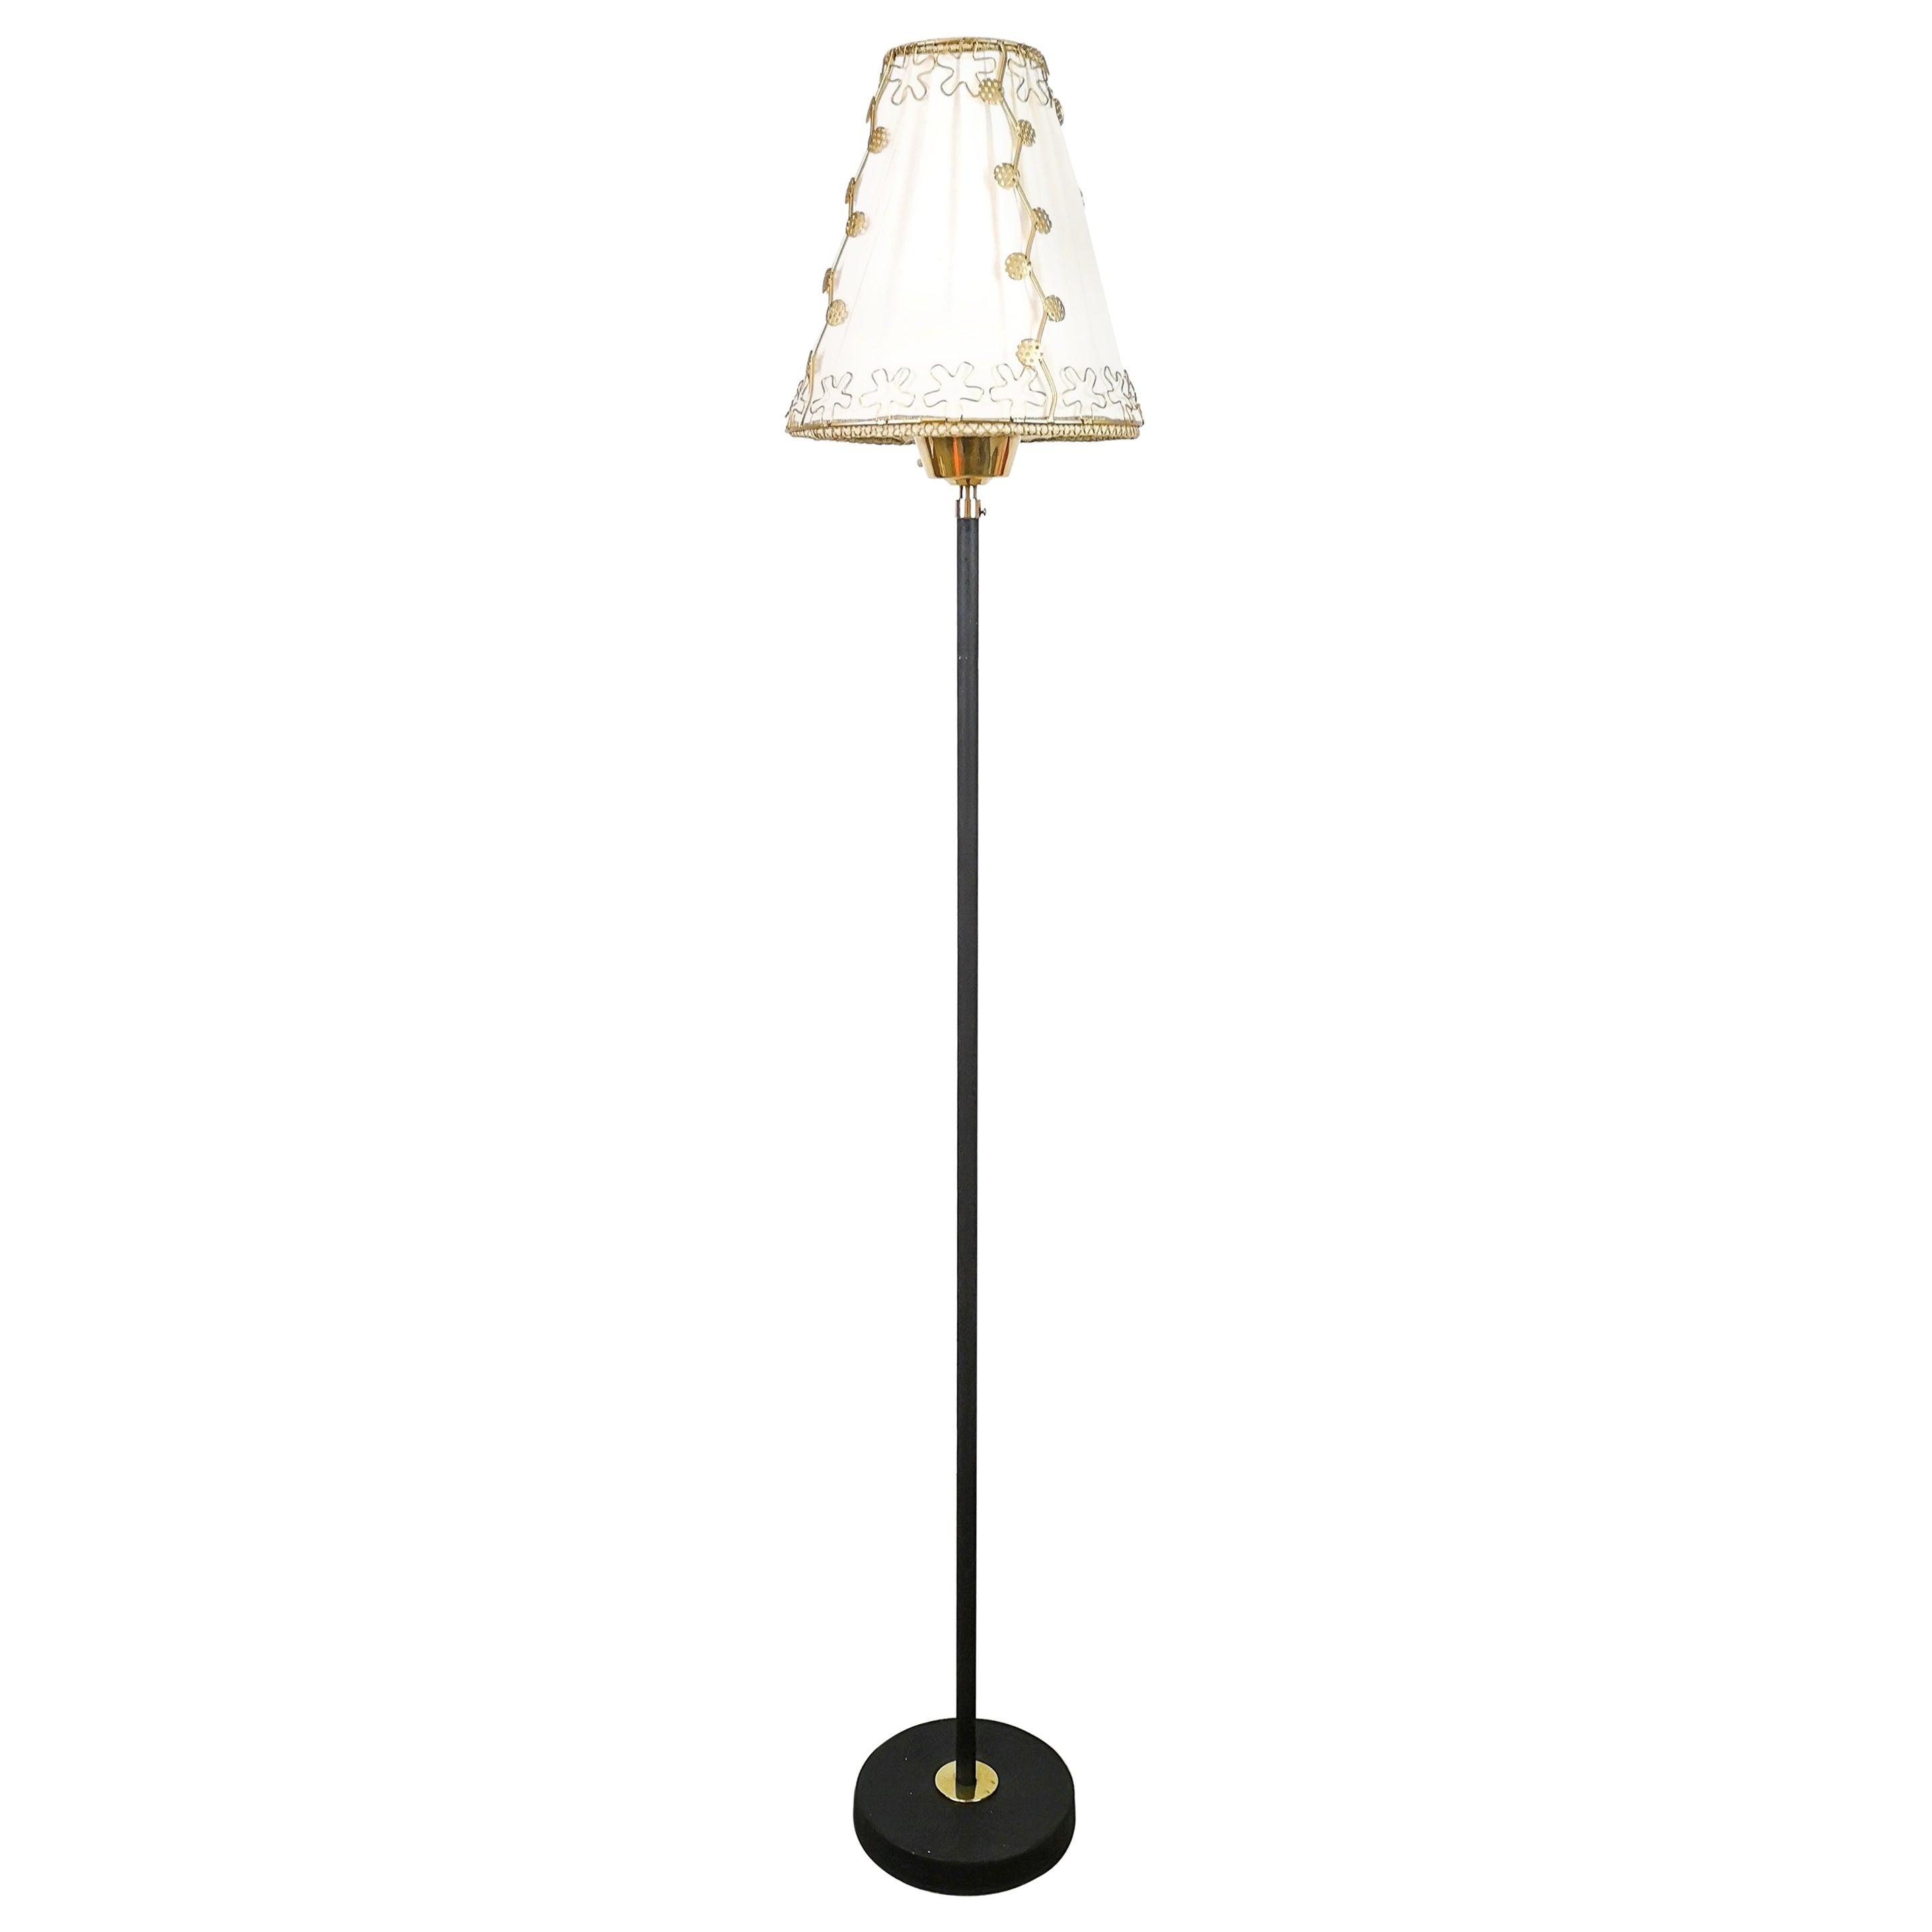 Midcentury Cast Iron and Brass Floor Lamp Ewå, Sweden, 1960s